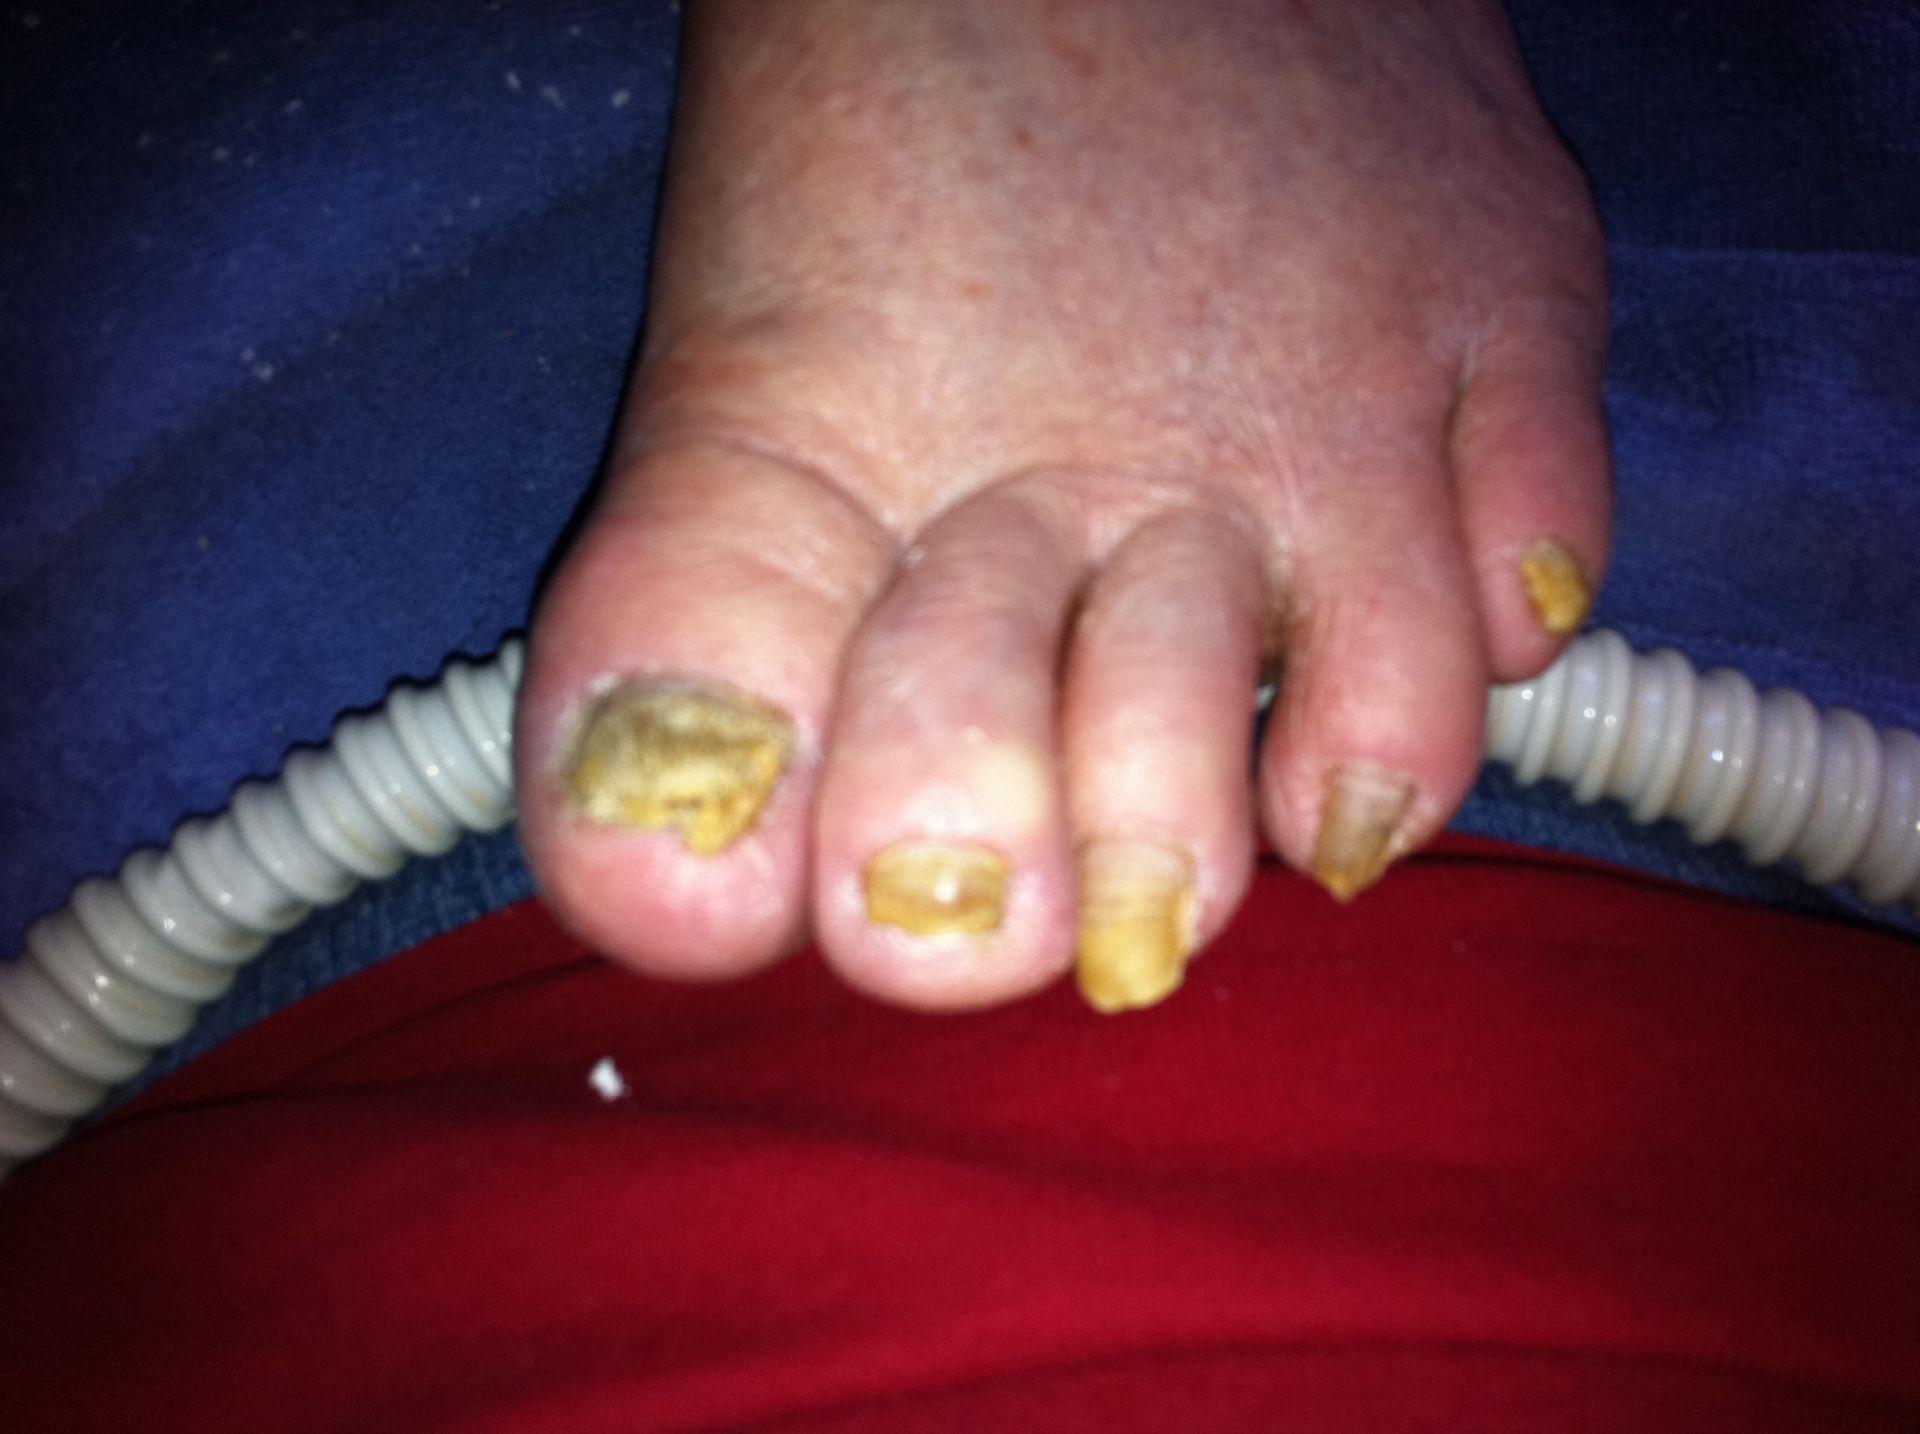 Suspected mycosis on the toenails